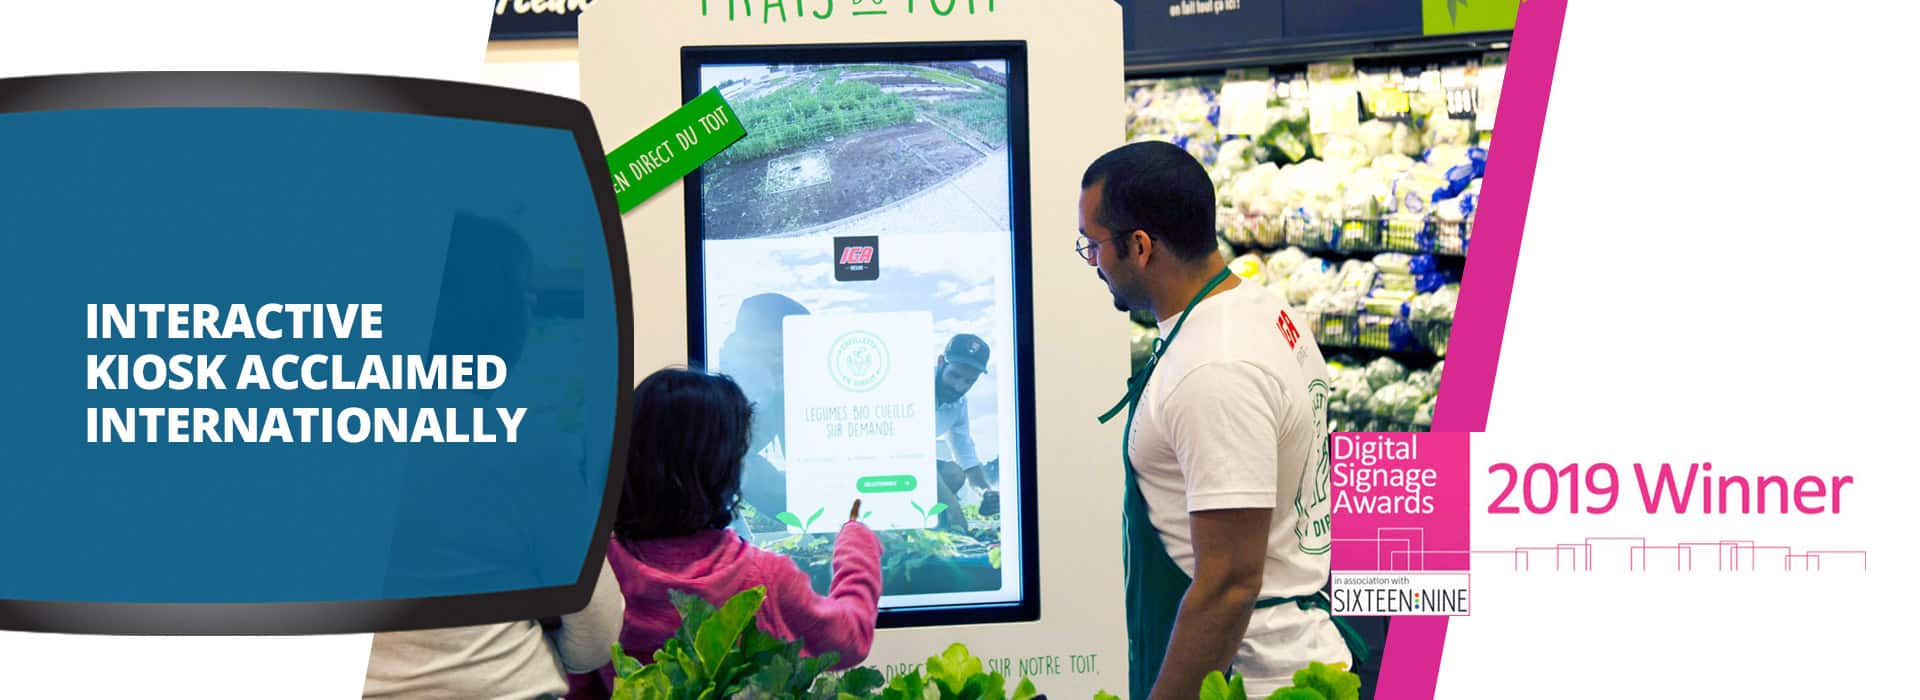 Digital signage winner